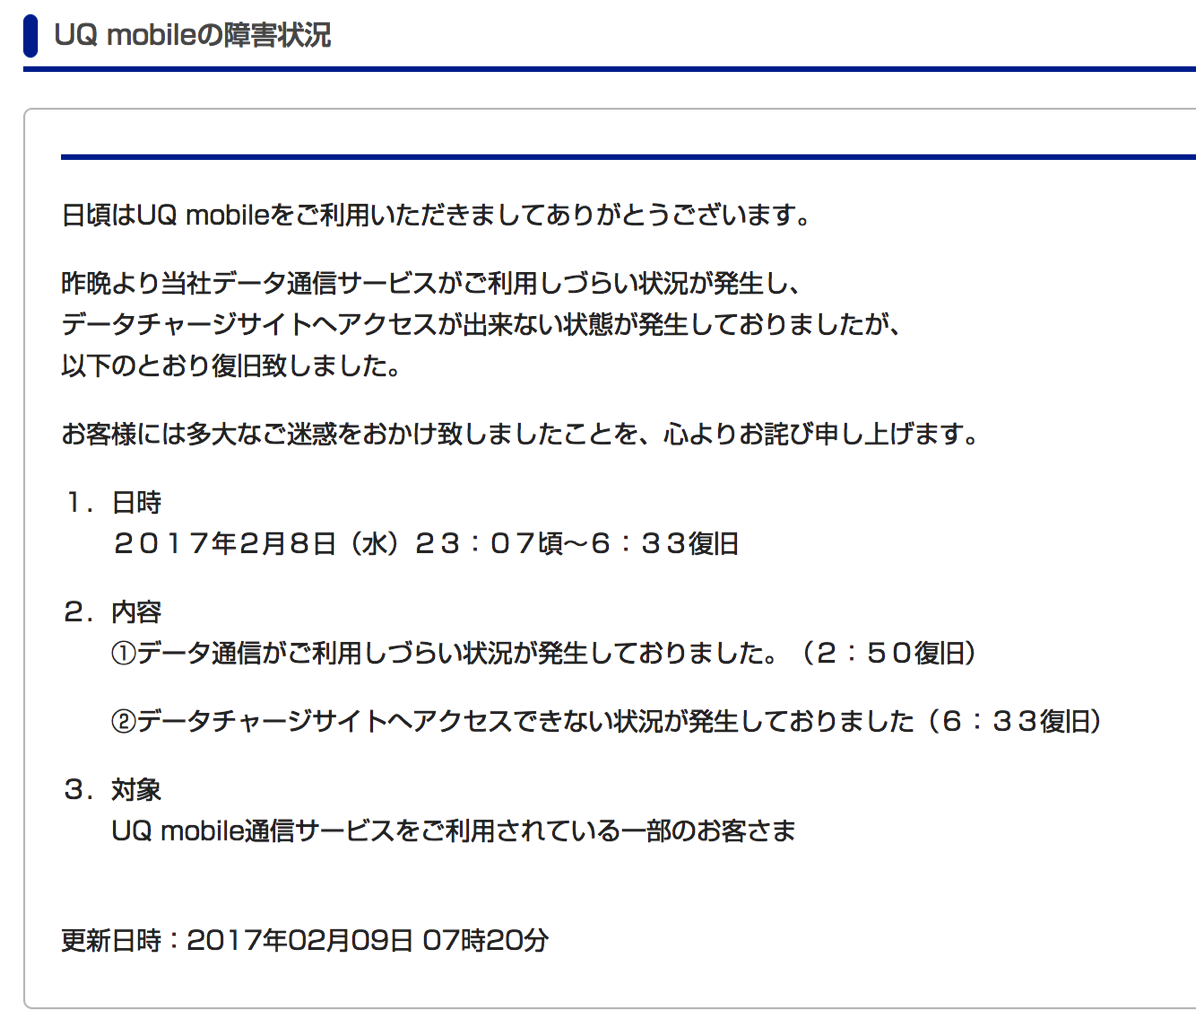 UQ mobile:2月8日(水) 23:00頃からデータ通信障害が発生